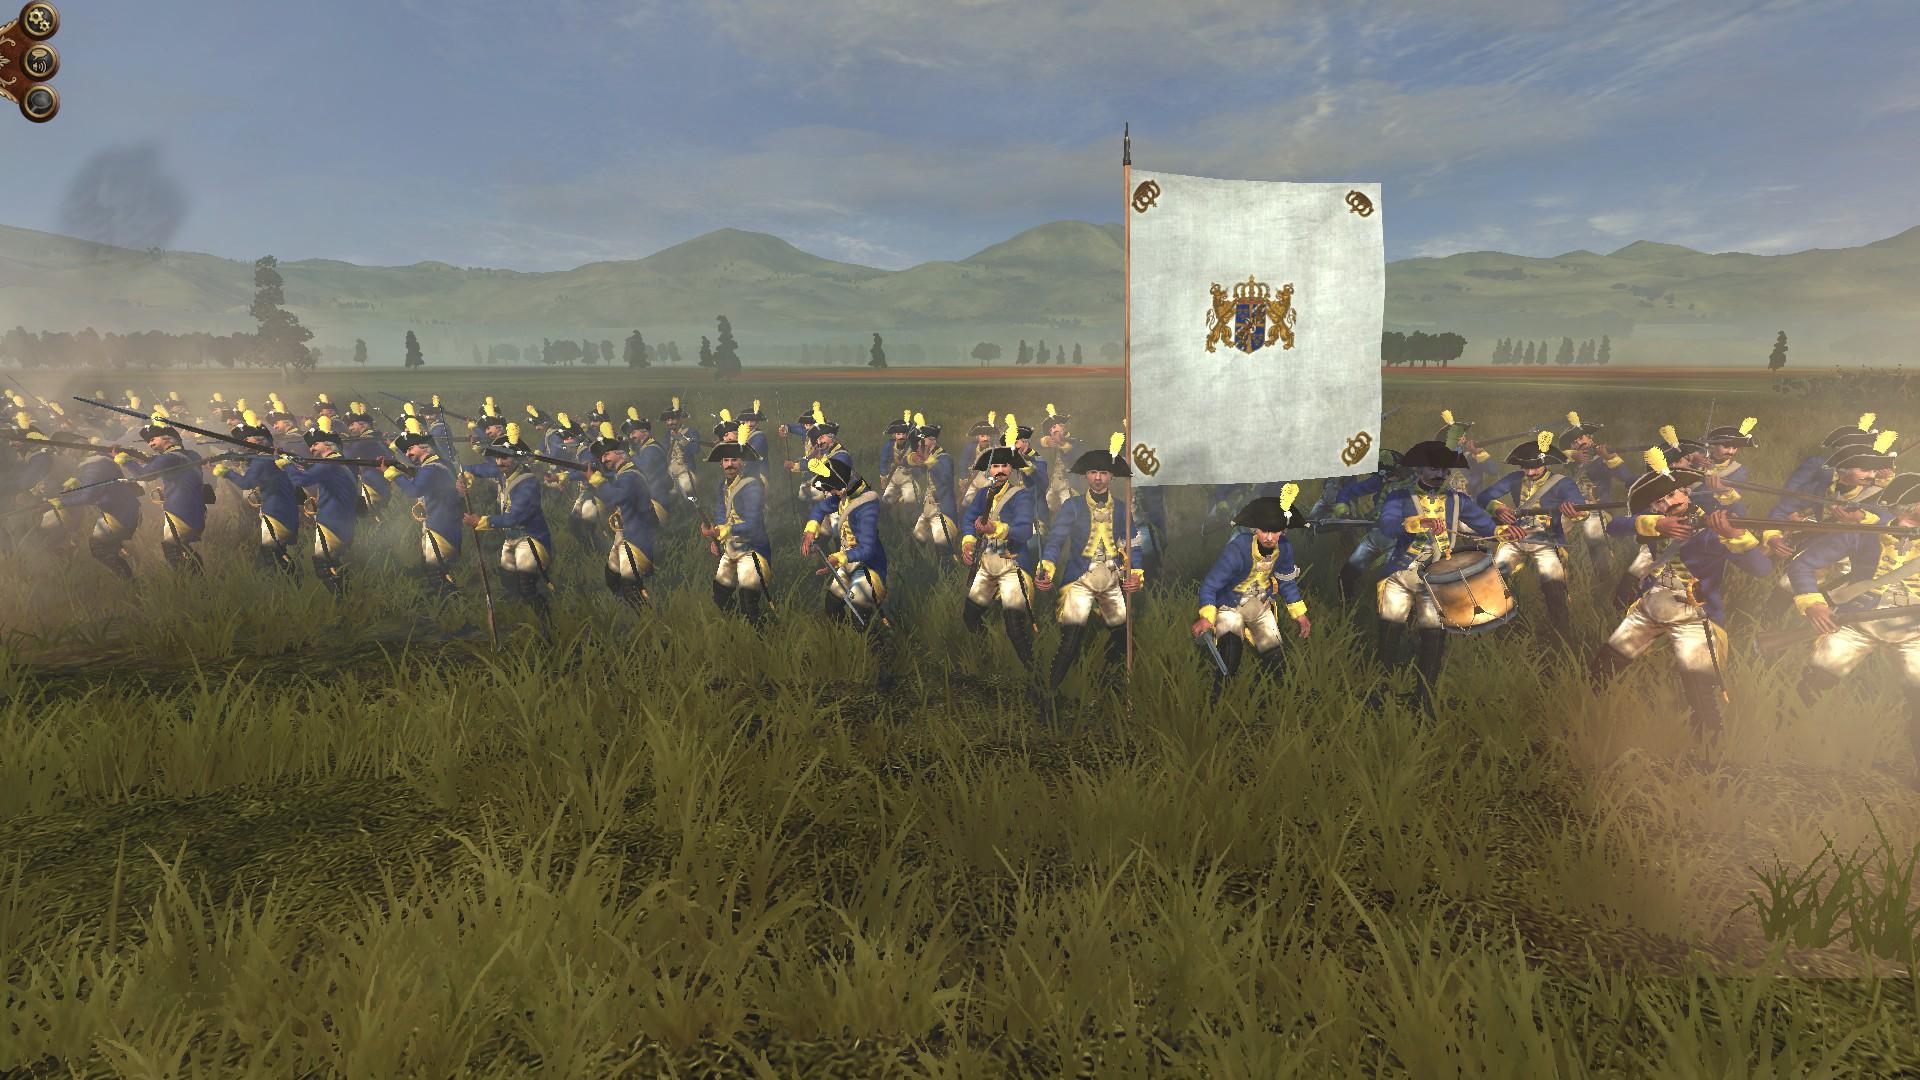 Drottningens lif regemente